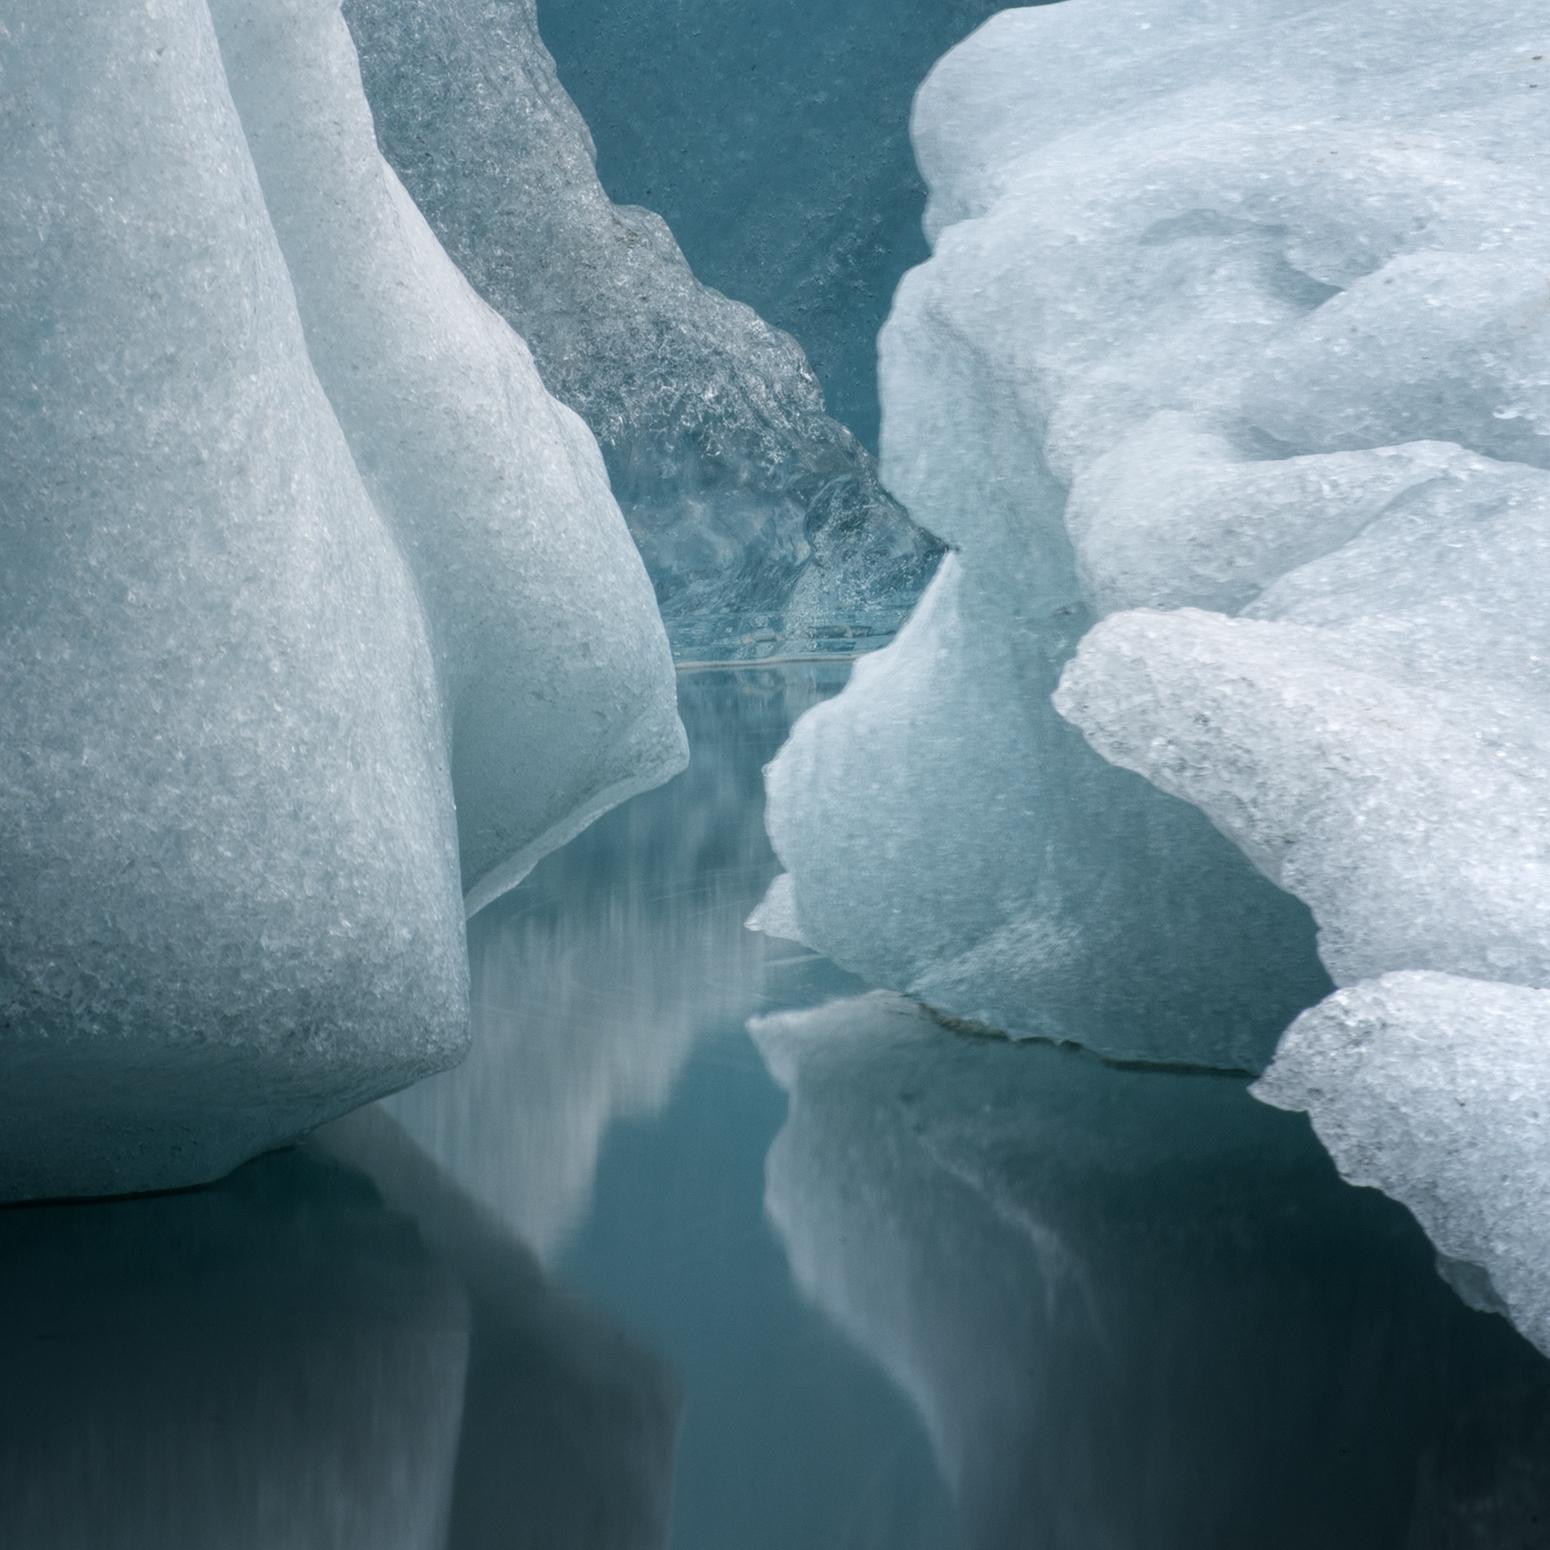 Looking into the heart of the iceberg, Jokulsarlon Lagoon, Iceland (Photo Credit:   LouiseShoemaker)